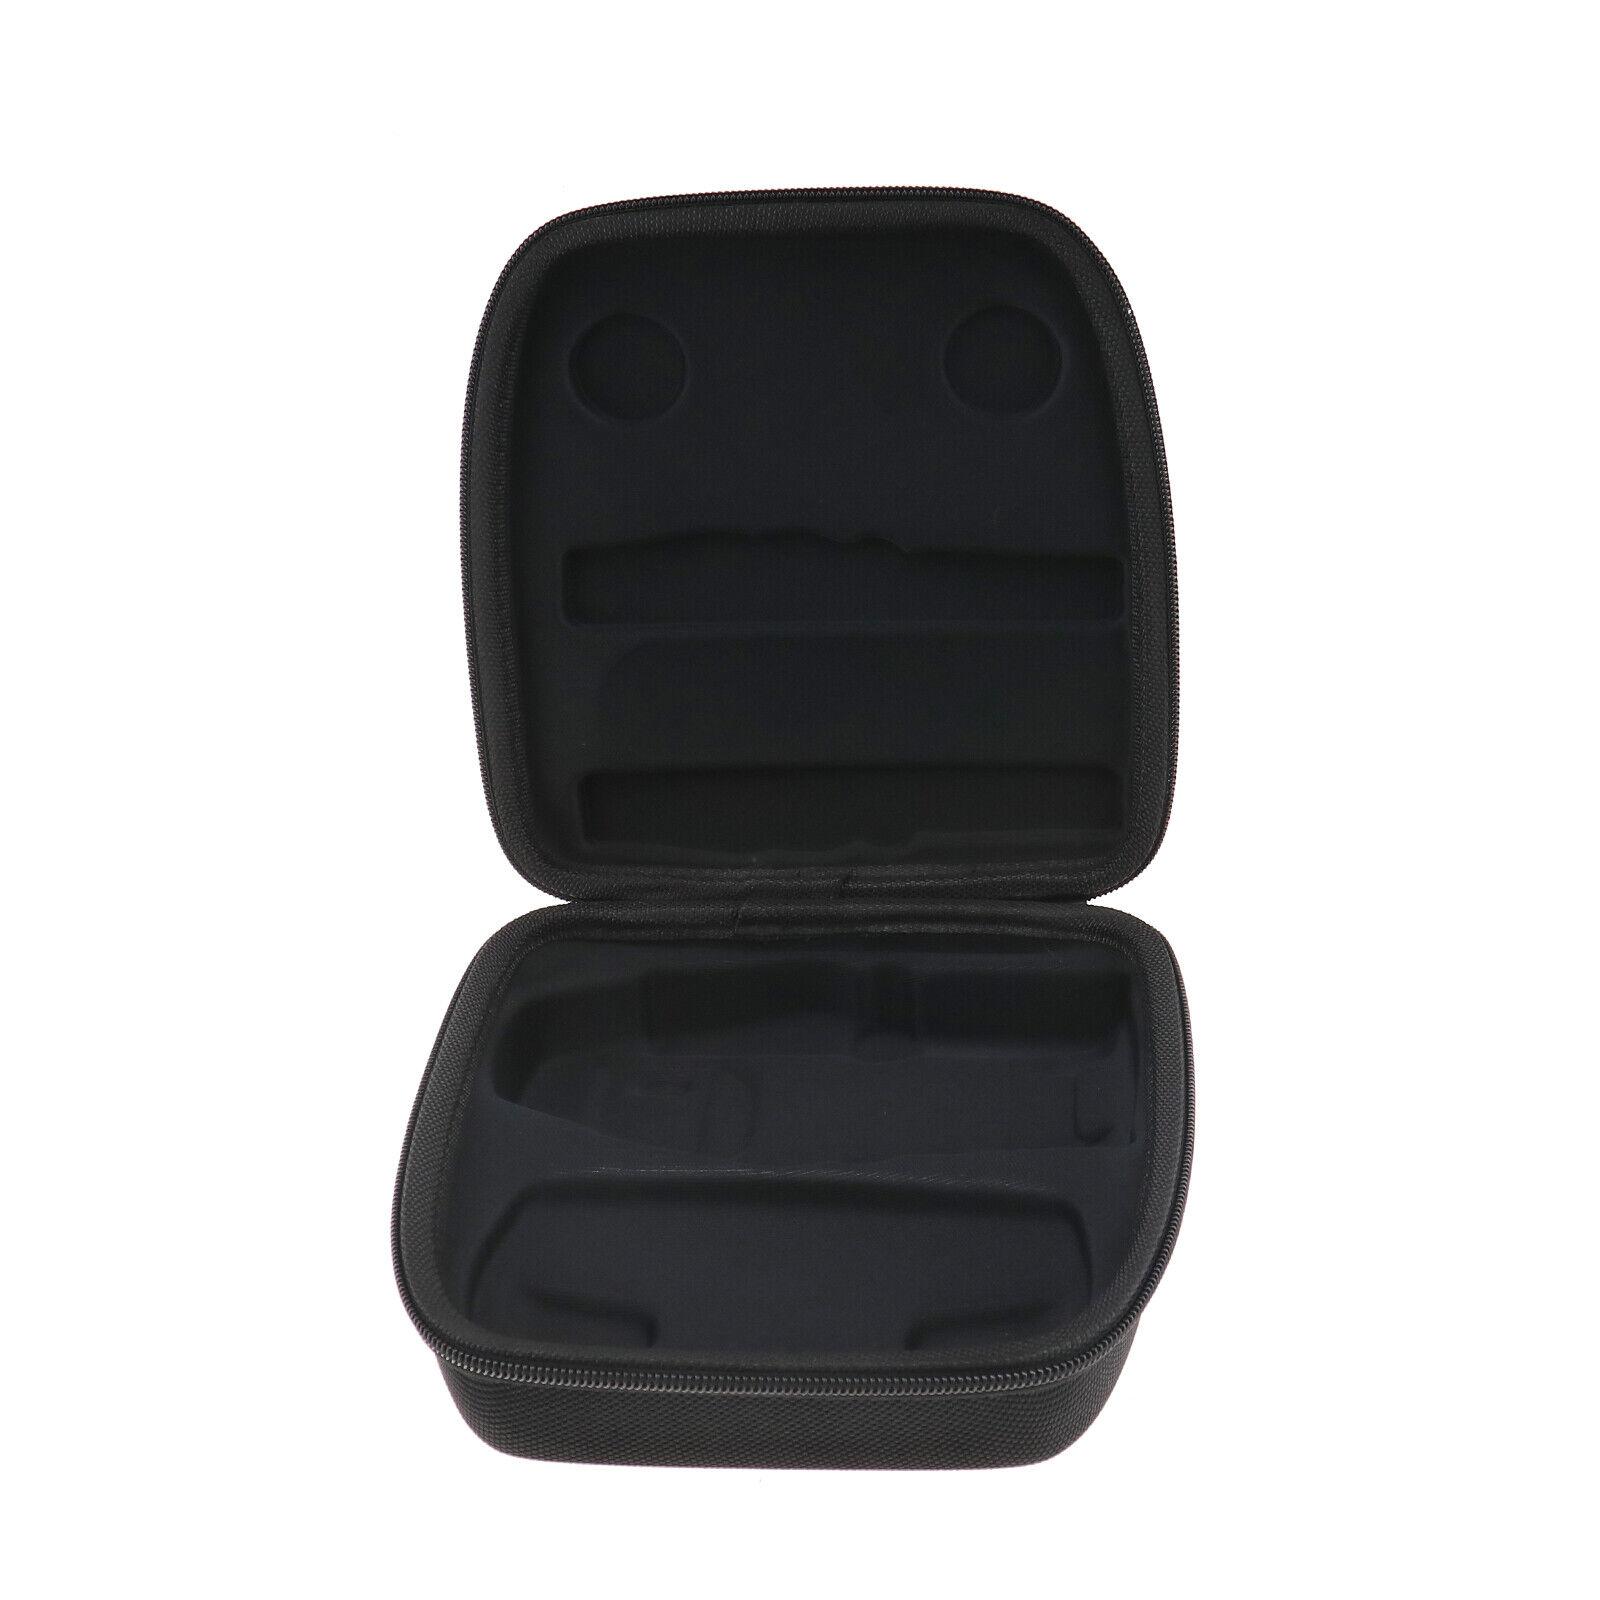 Hard Case EVA Carry Bag Protect Waterproof Support For DJI Mavic Air Controller